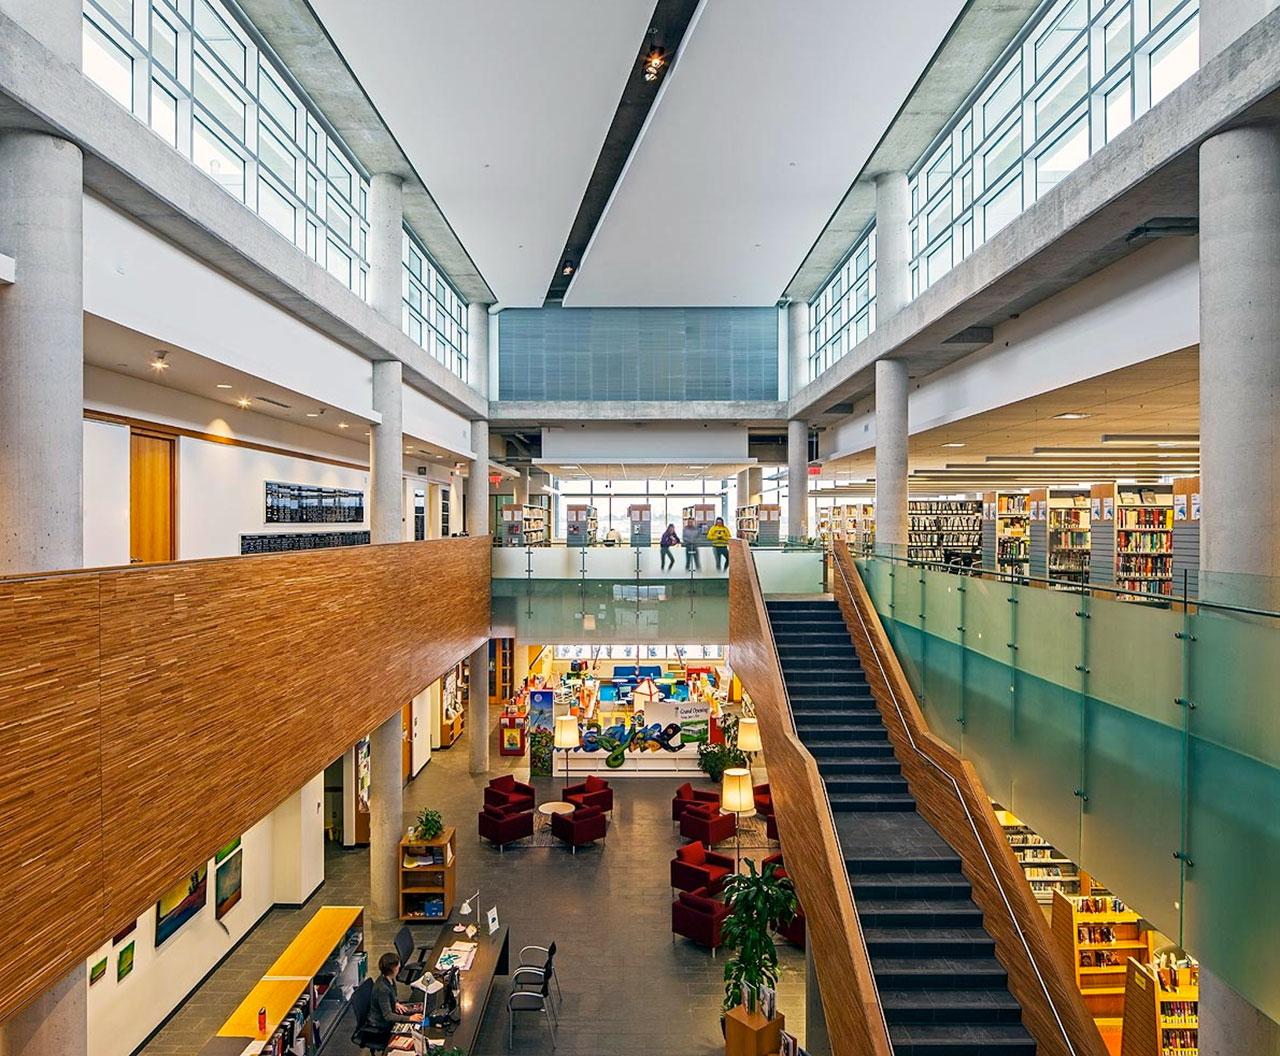 Bradford West Gwillimbary Library 3 - BNC.jpg